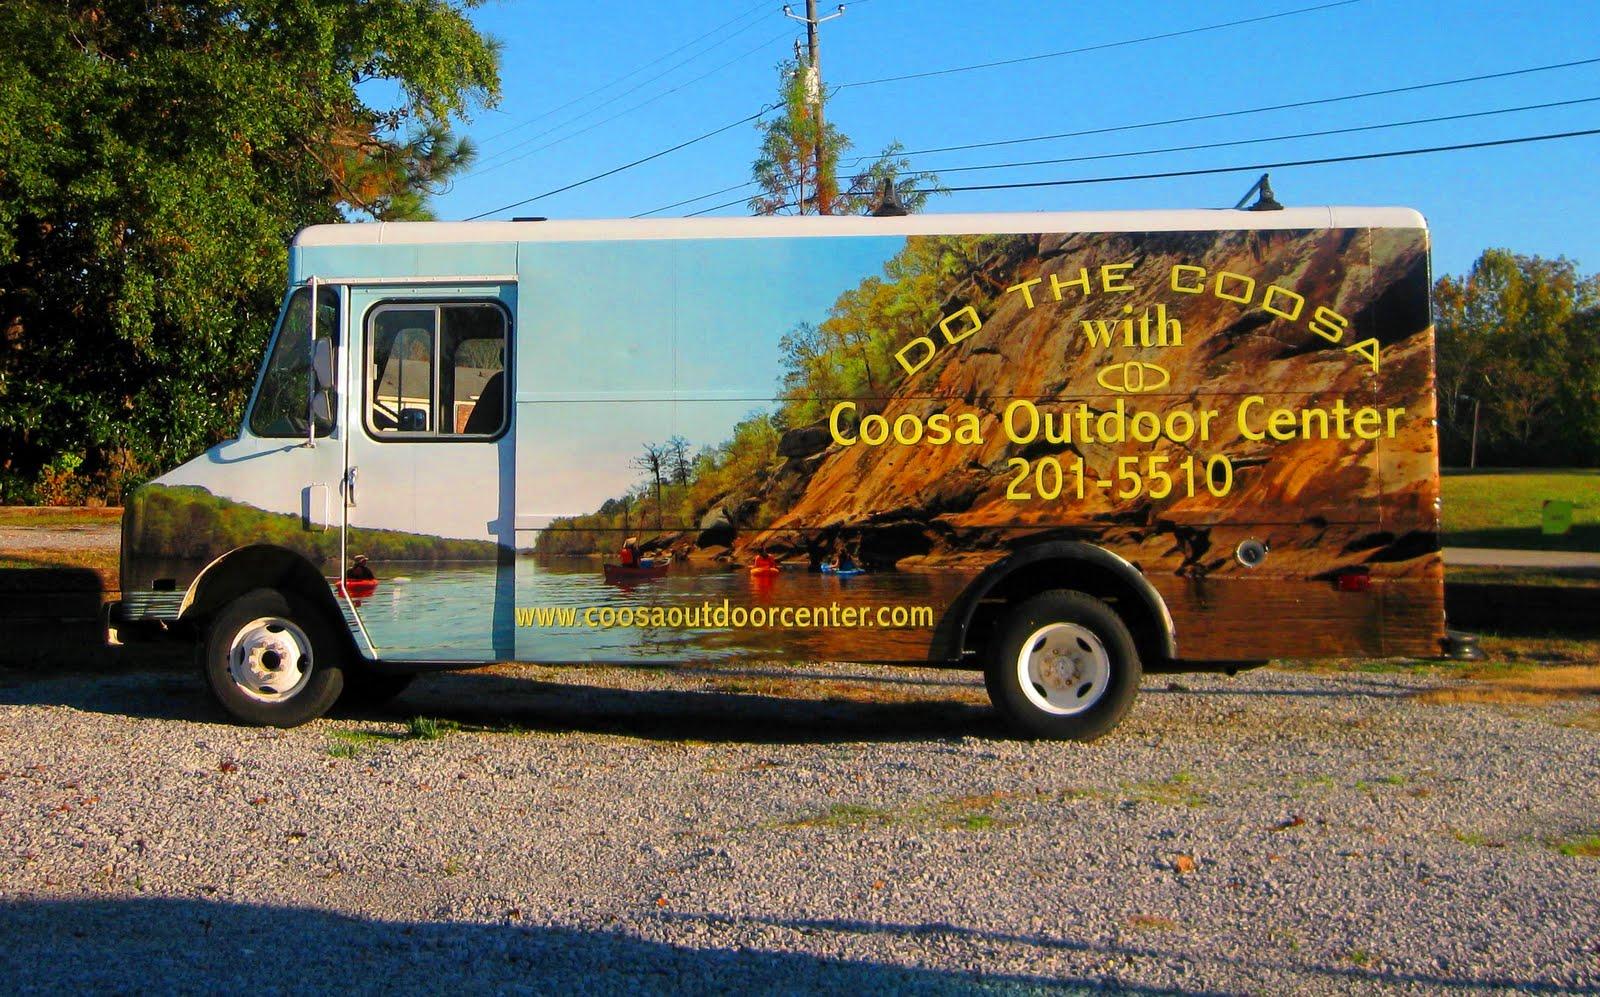 Southeastern Literary Tourism Initiative: